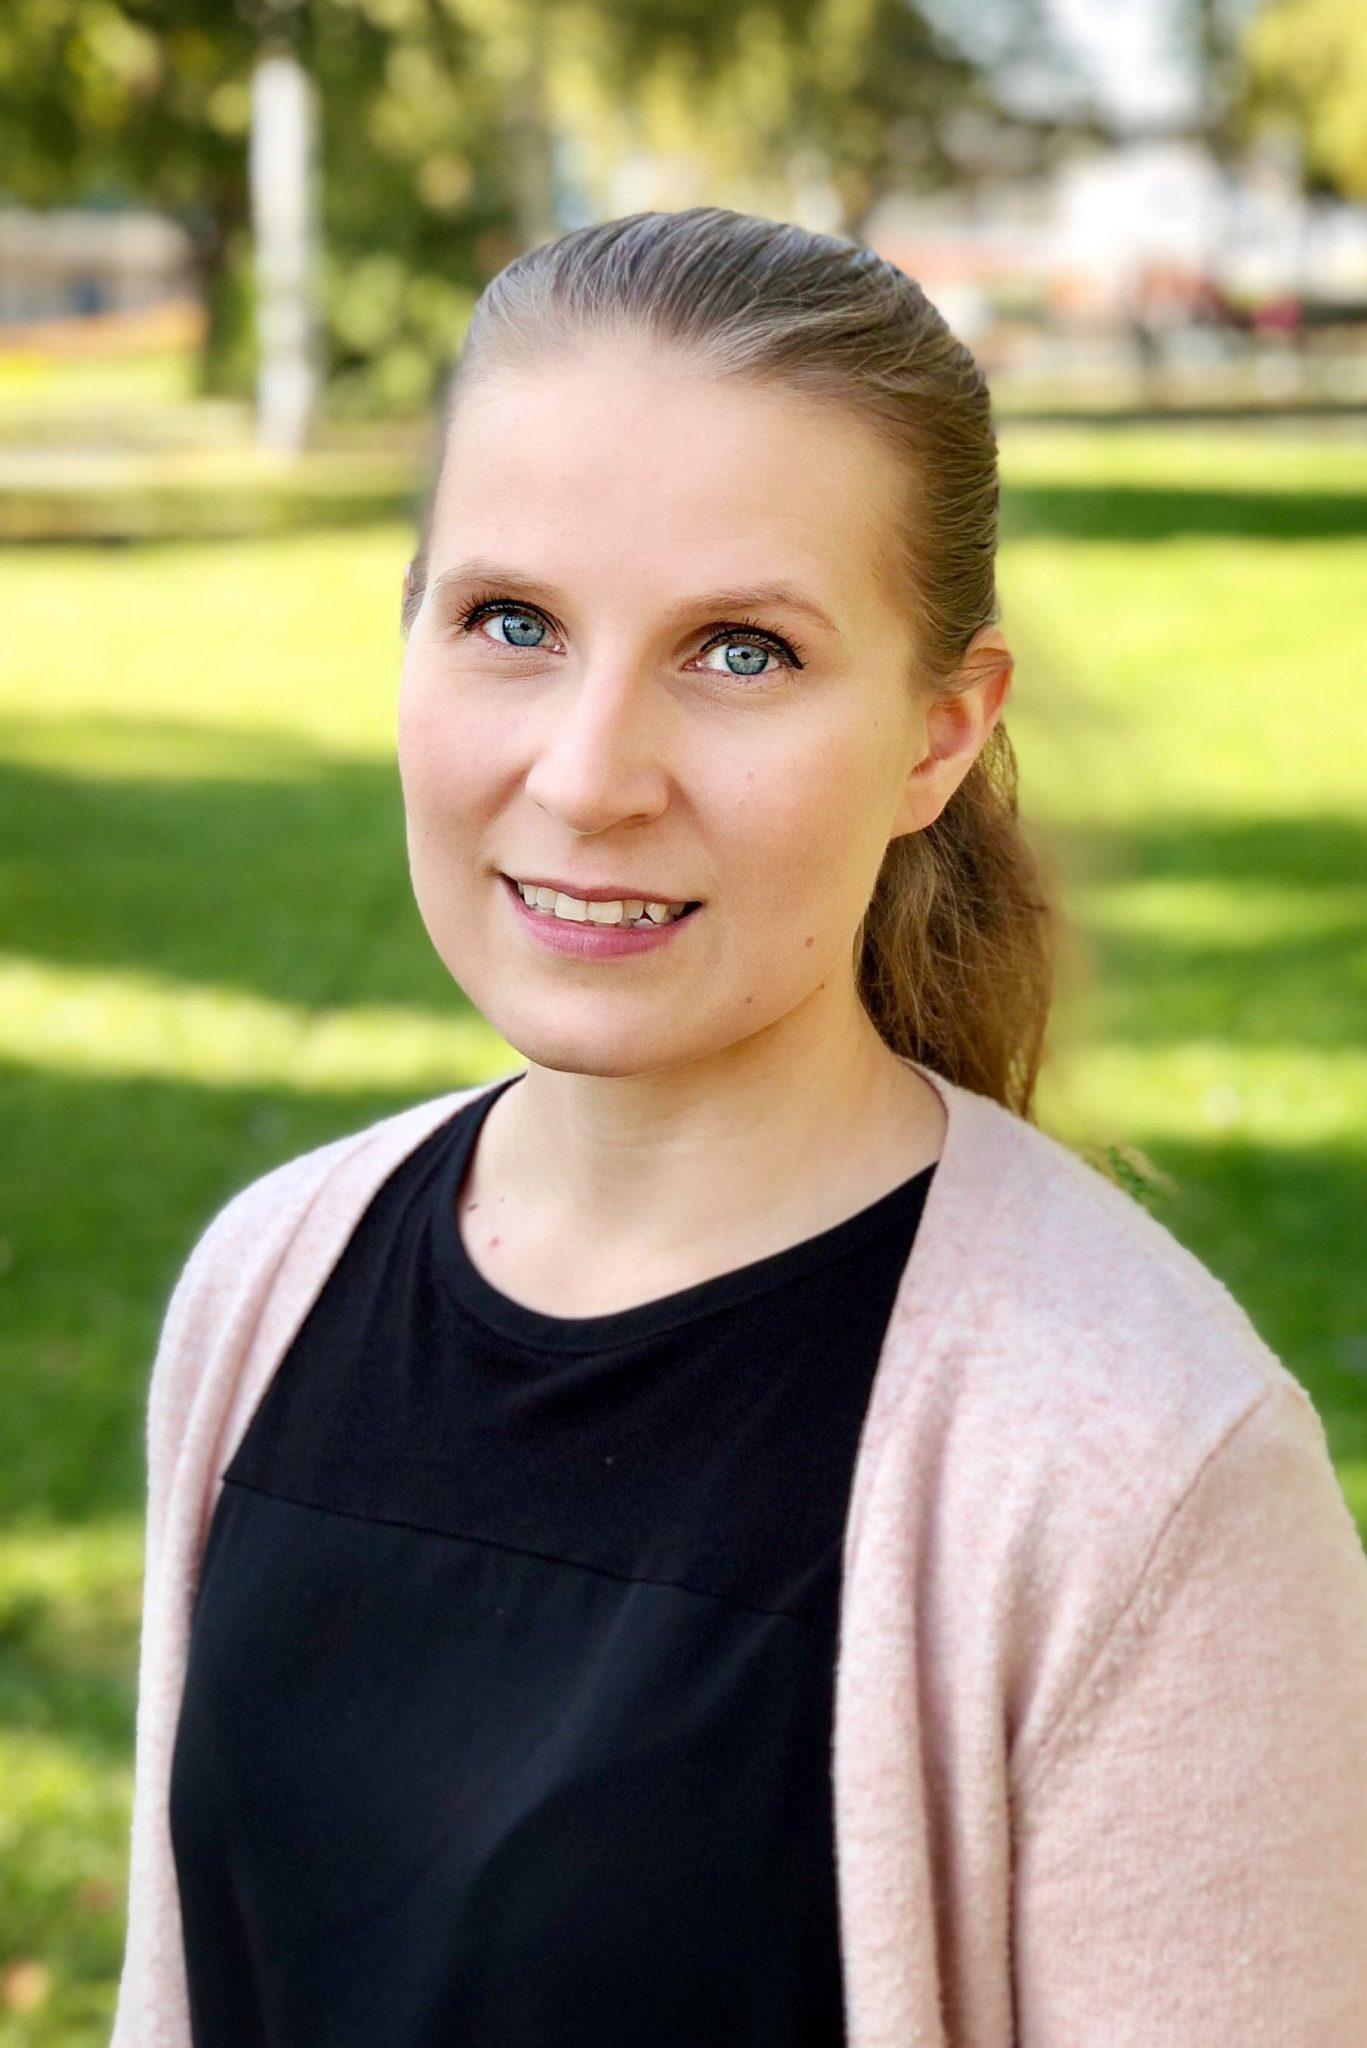 Ellinoora Ojala : Projektipäällikkö / Työkuntoa Keski-Karjalaan -hanke, Kunta-HYTE 2.0 -hanke